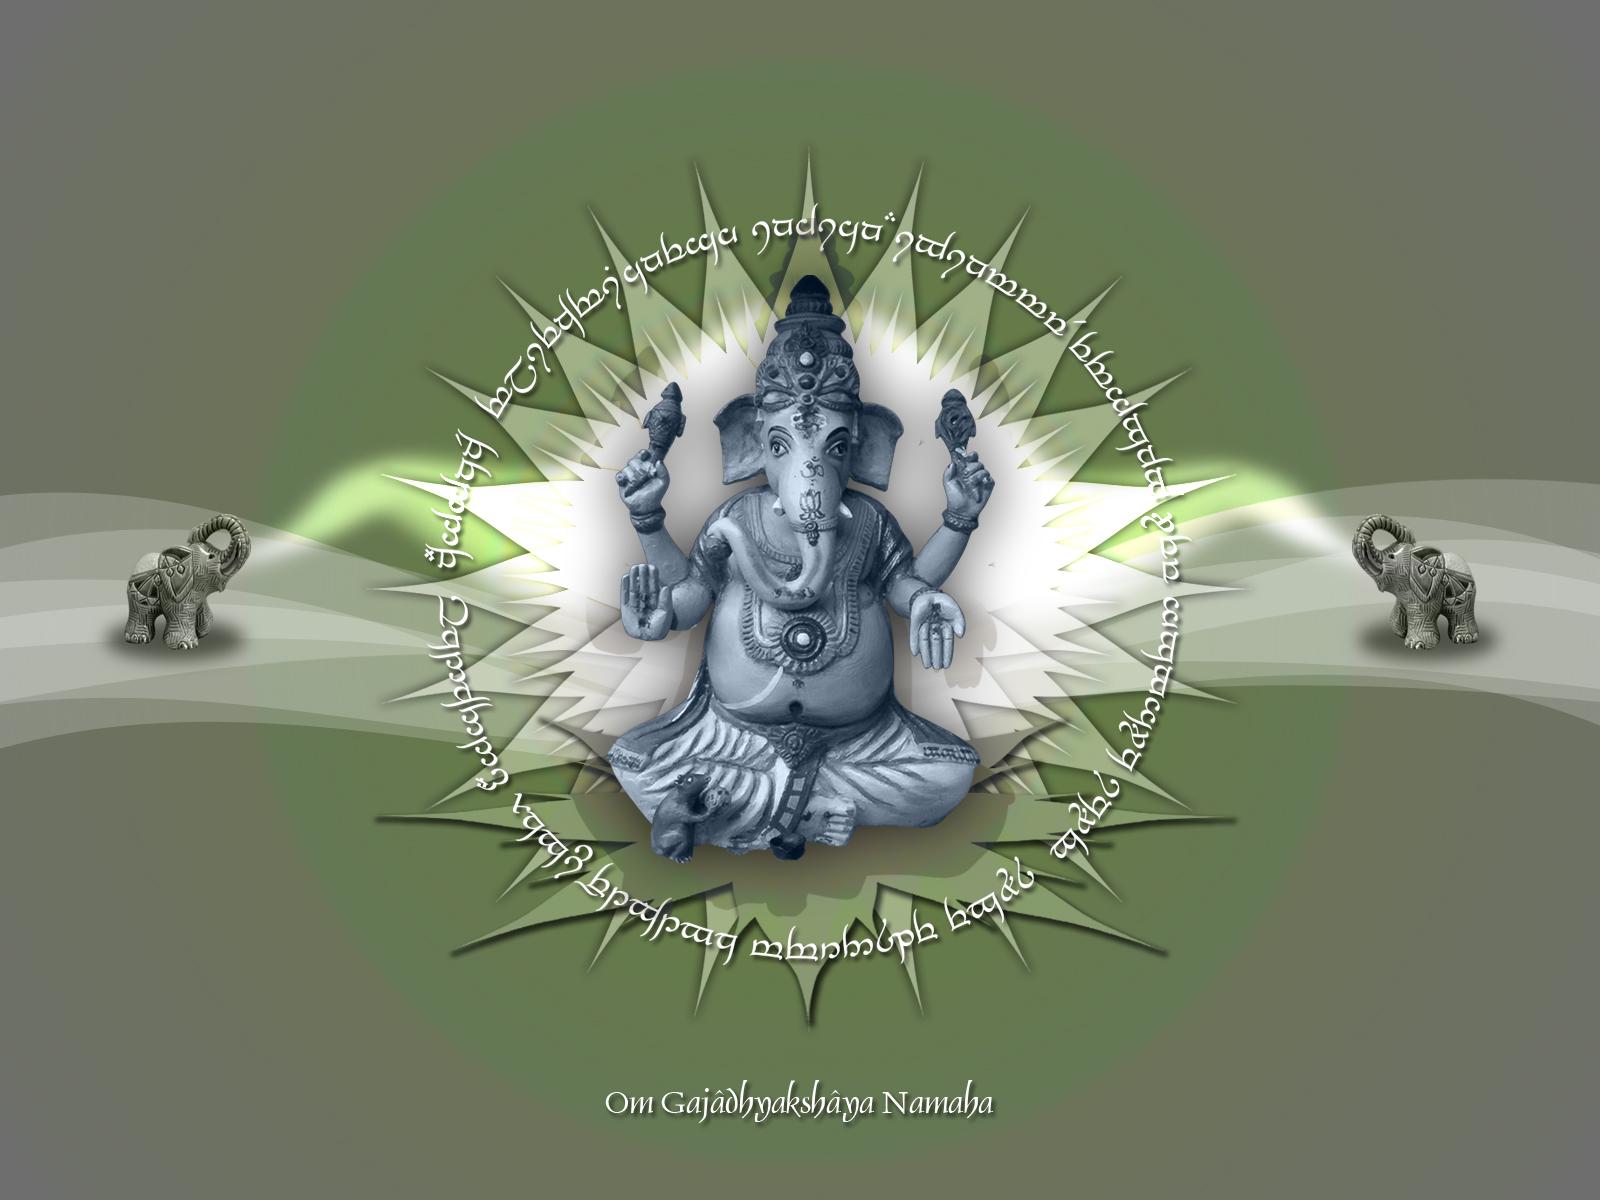 http://3.bp.blogspot.com/_WOWQJUlRtKQ/TQZnrr0MXFI/AAAAAAAAAxA/Lgi4GhC6kZo/s1600/Lord+Ganesha+6.jpg